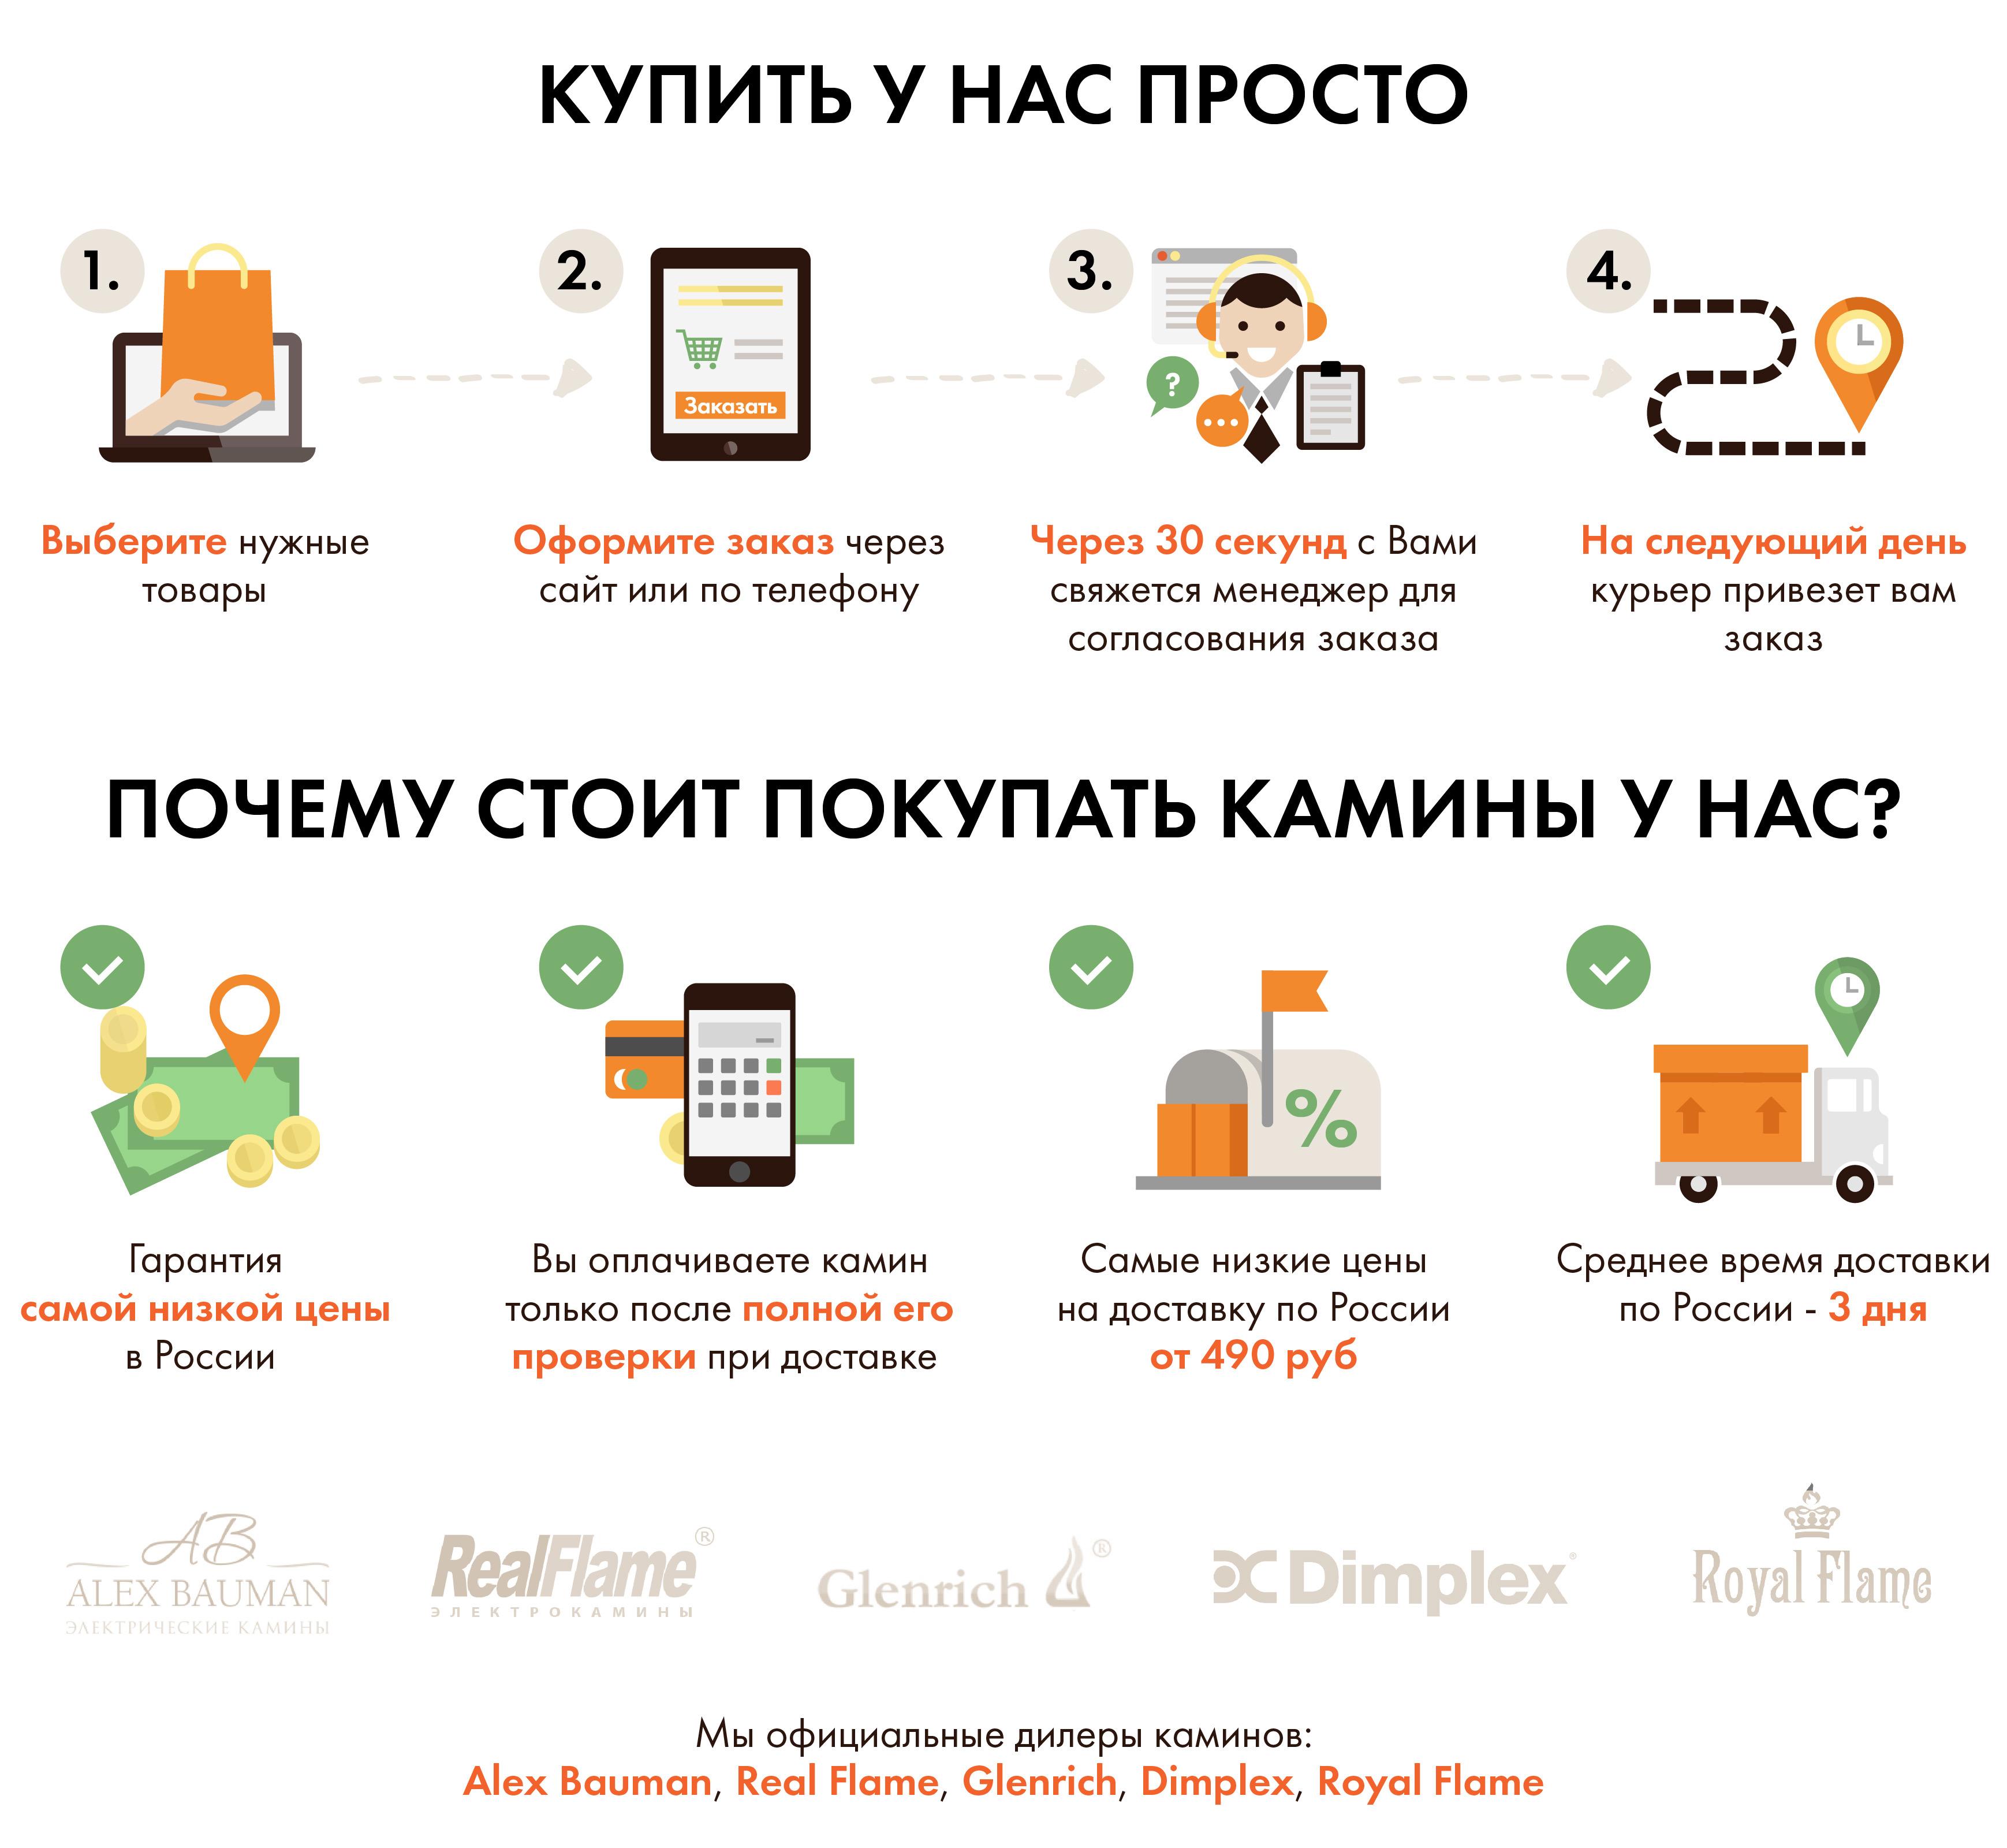 https://bio-kamin24.ru/images/upload/kupit_u_nas_prosto_bio.JPG